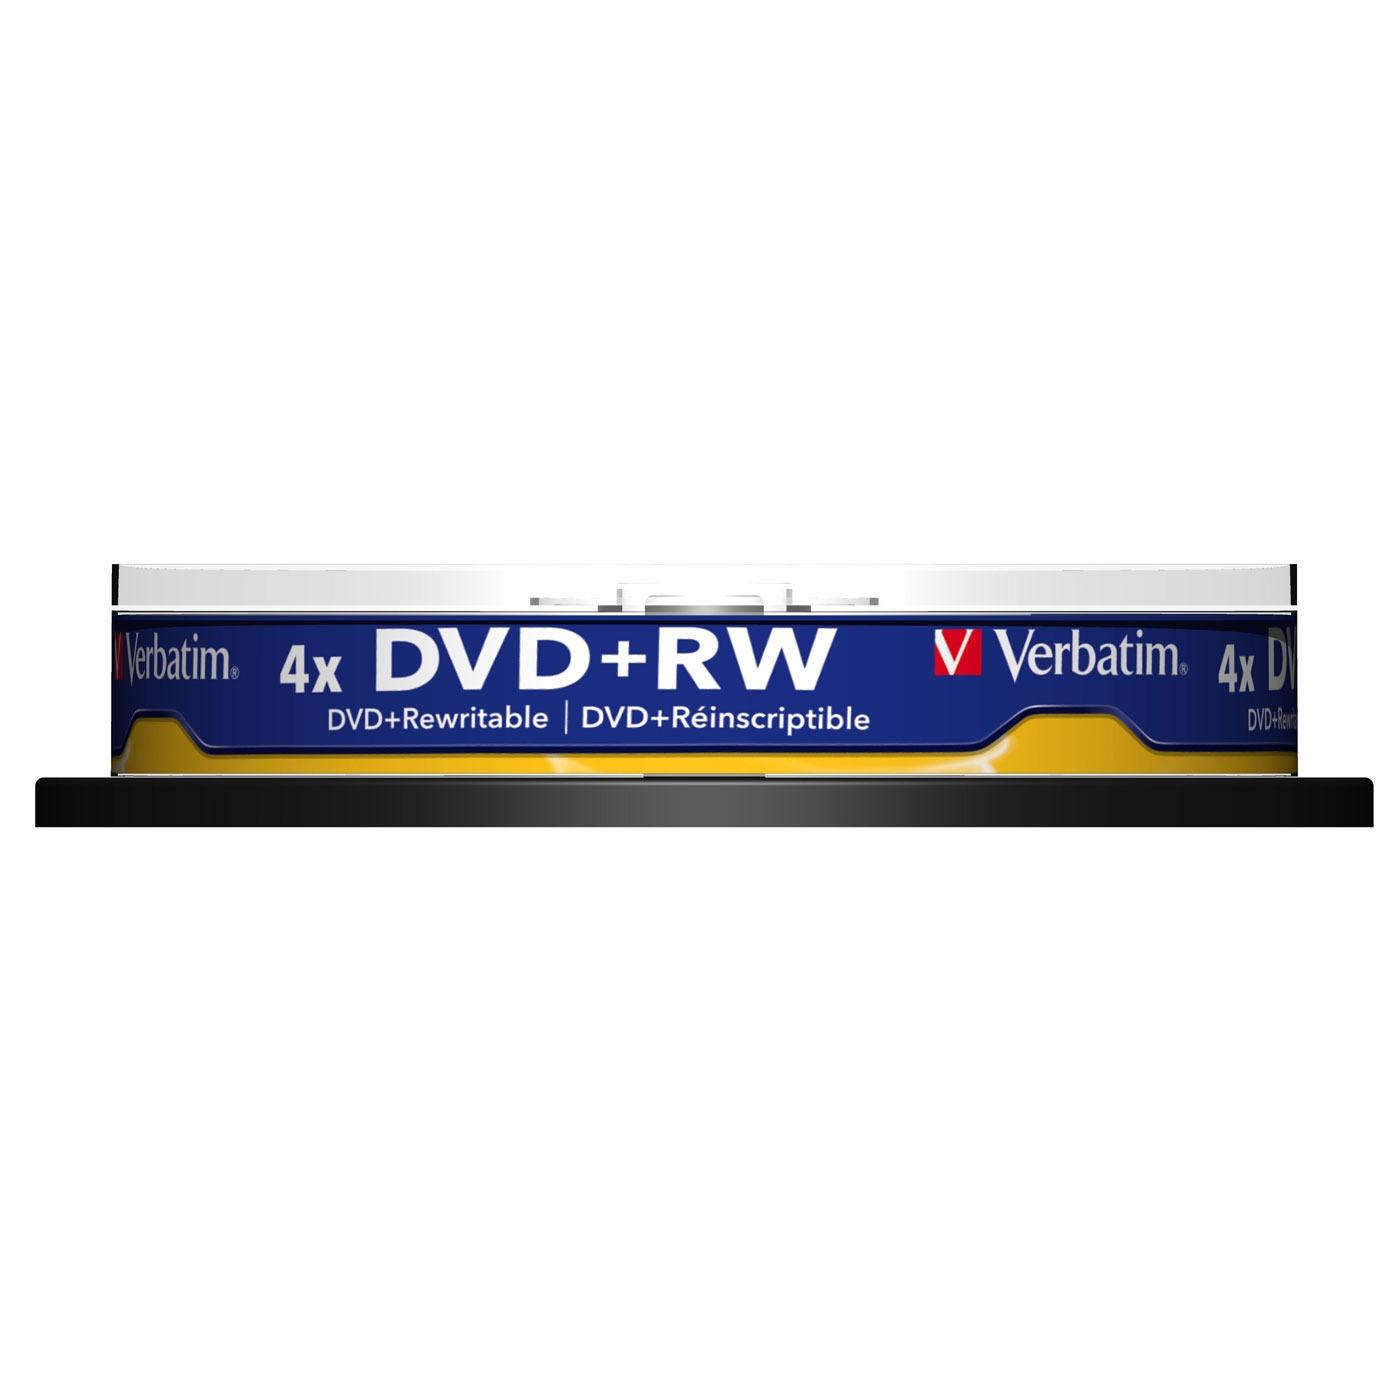 DVD Verbatim DVD+RW 4.7 Go certifié 4x (pack de 10, spindle) Verbatim DVD+RW 4.7 Go certifié 4x (pack de 10, spindle)